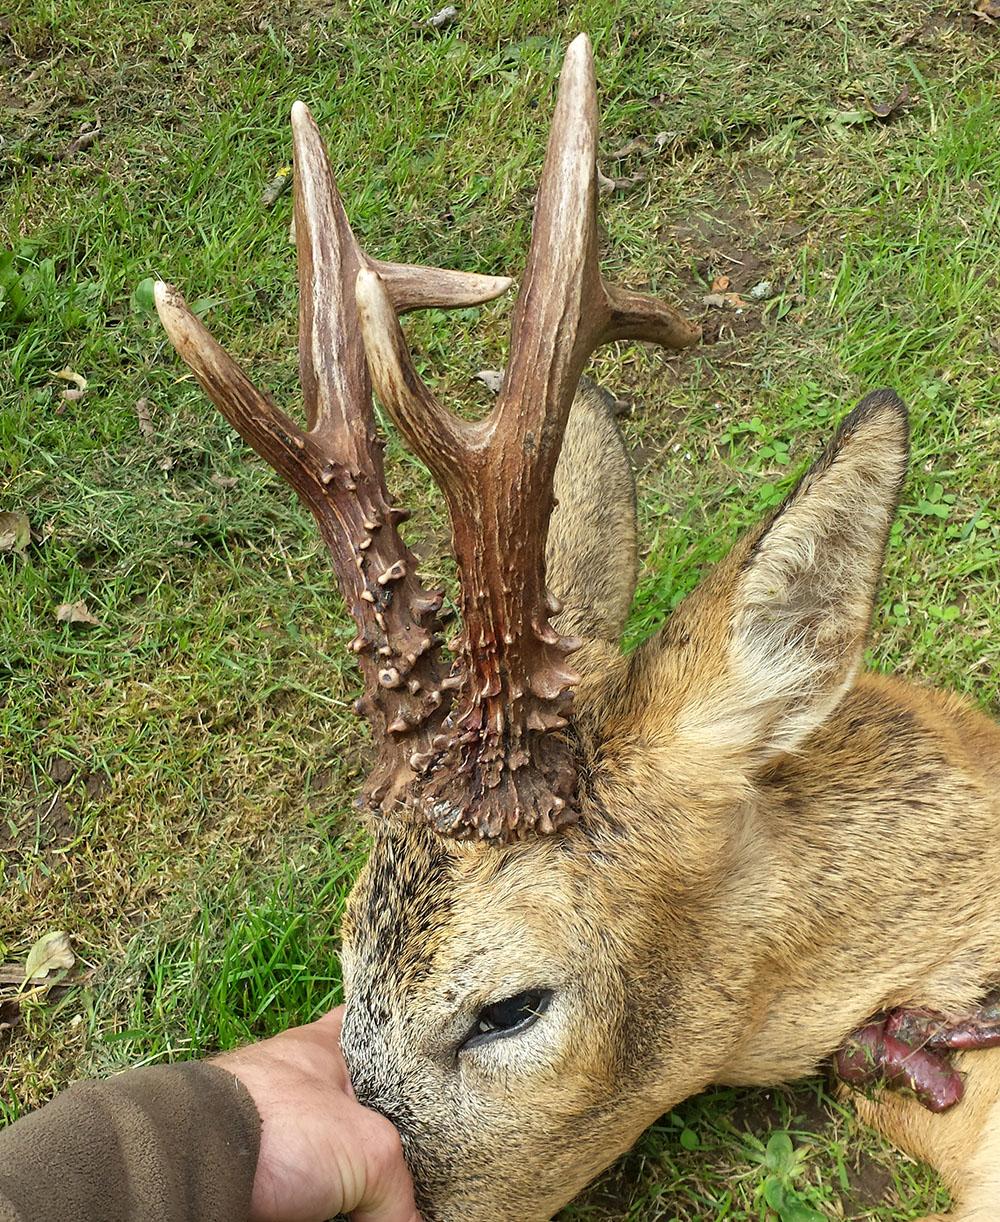 Råbockens horn var 25 respektive 24,5 centimeter långa. Foto: Privat